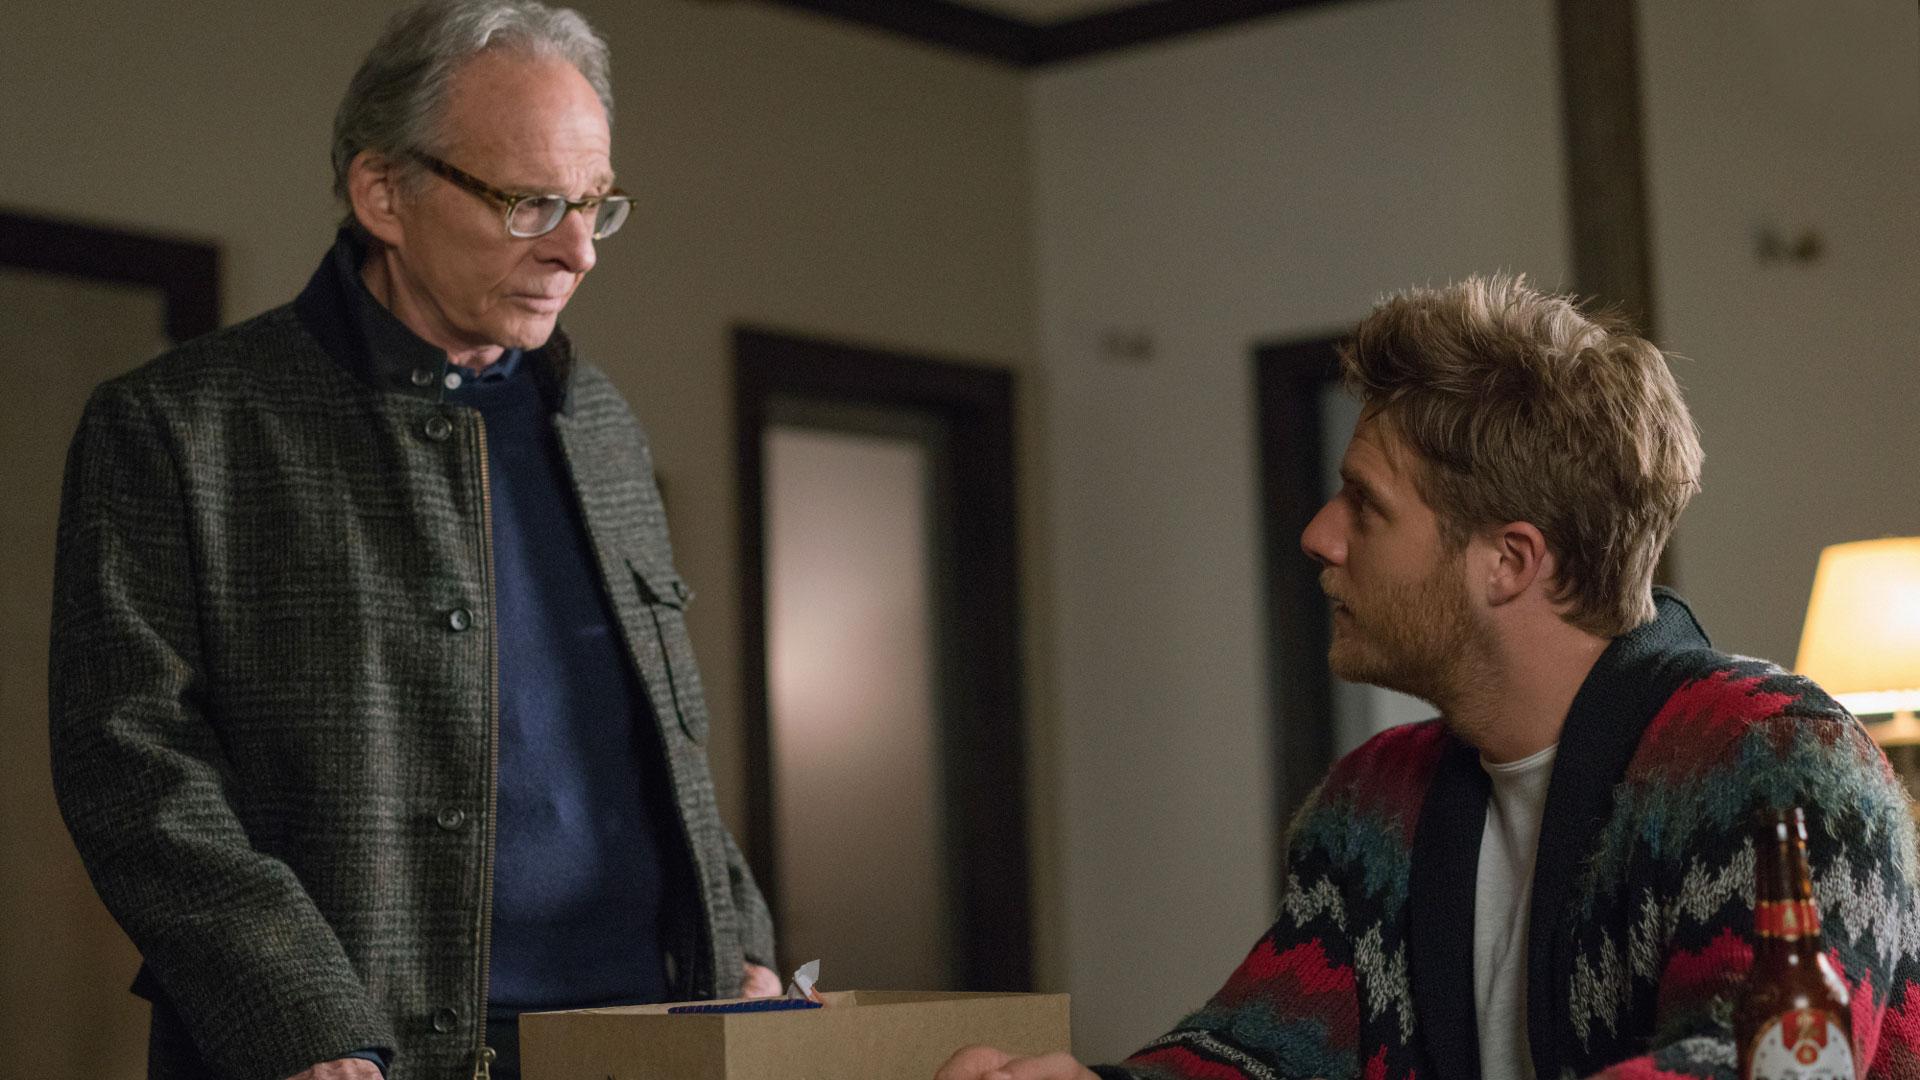 Ron Rifkin as Dennis Finch and Jake McDorman as Brian Finch